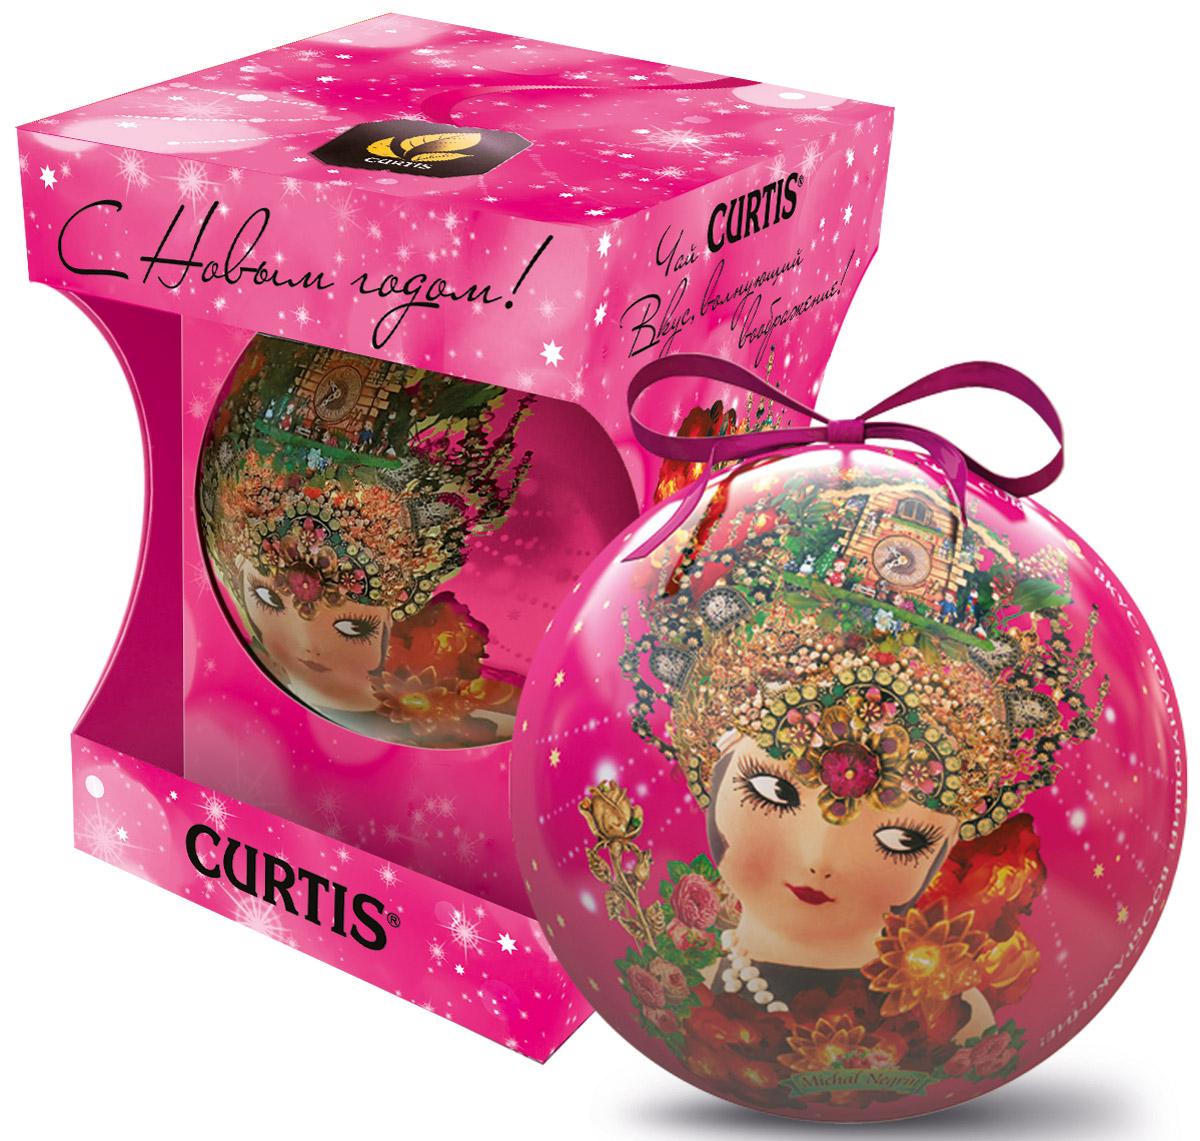 Curtis She-Shy Christmas Ball розовый, черный листовой чай, 30 г цена 2017